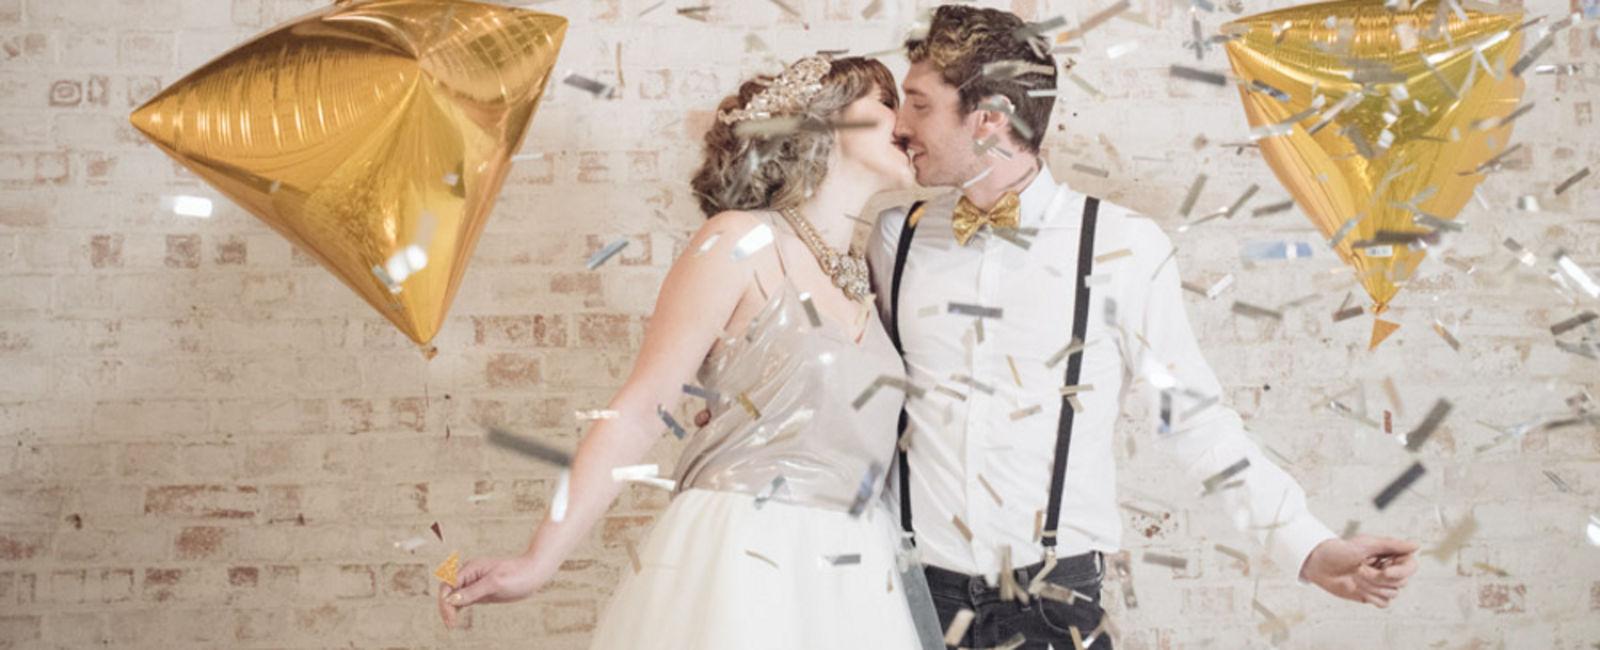 Decoratie bij trouwreportage